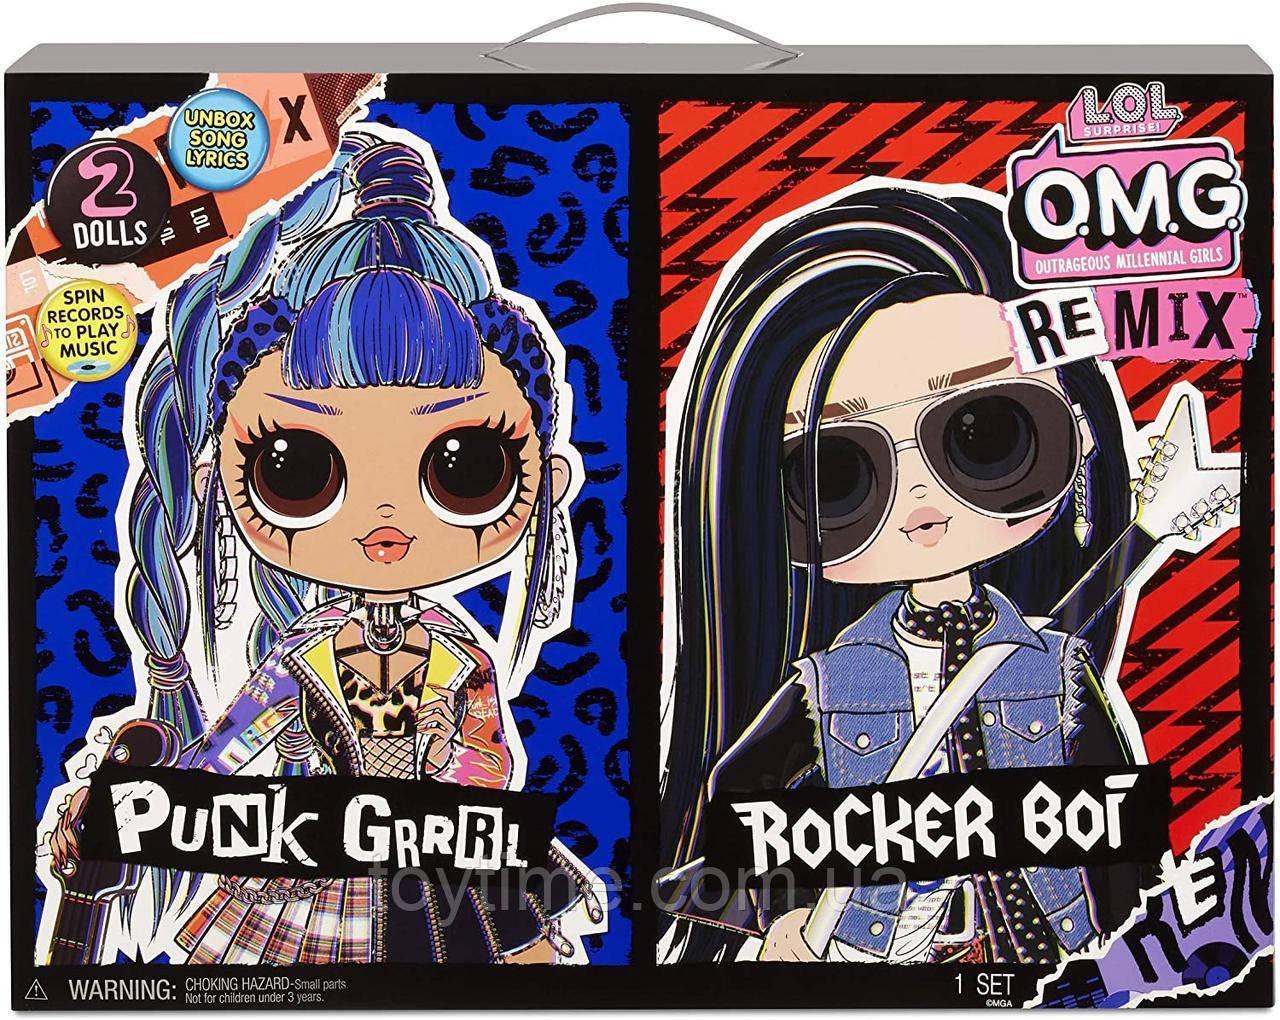 Кукольный набор LOL Surprise OMG Remix Дуэт / L.O.L. Surprise! O.M.G. Remix Rocker Boi and Punk Grrrl 2 Pack